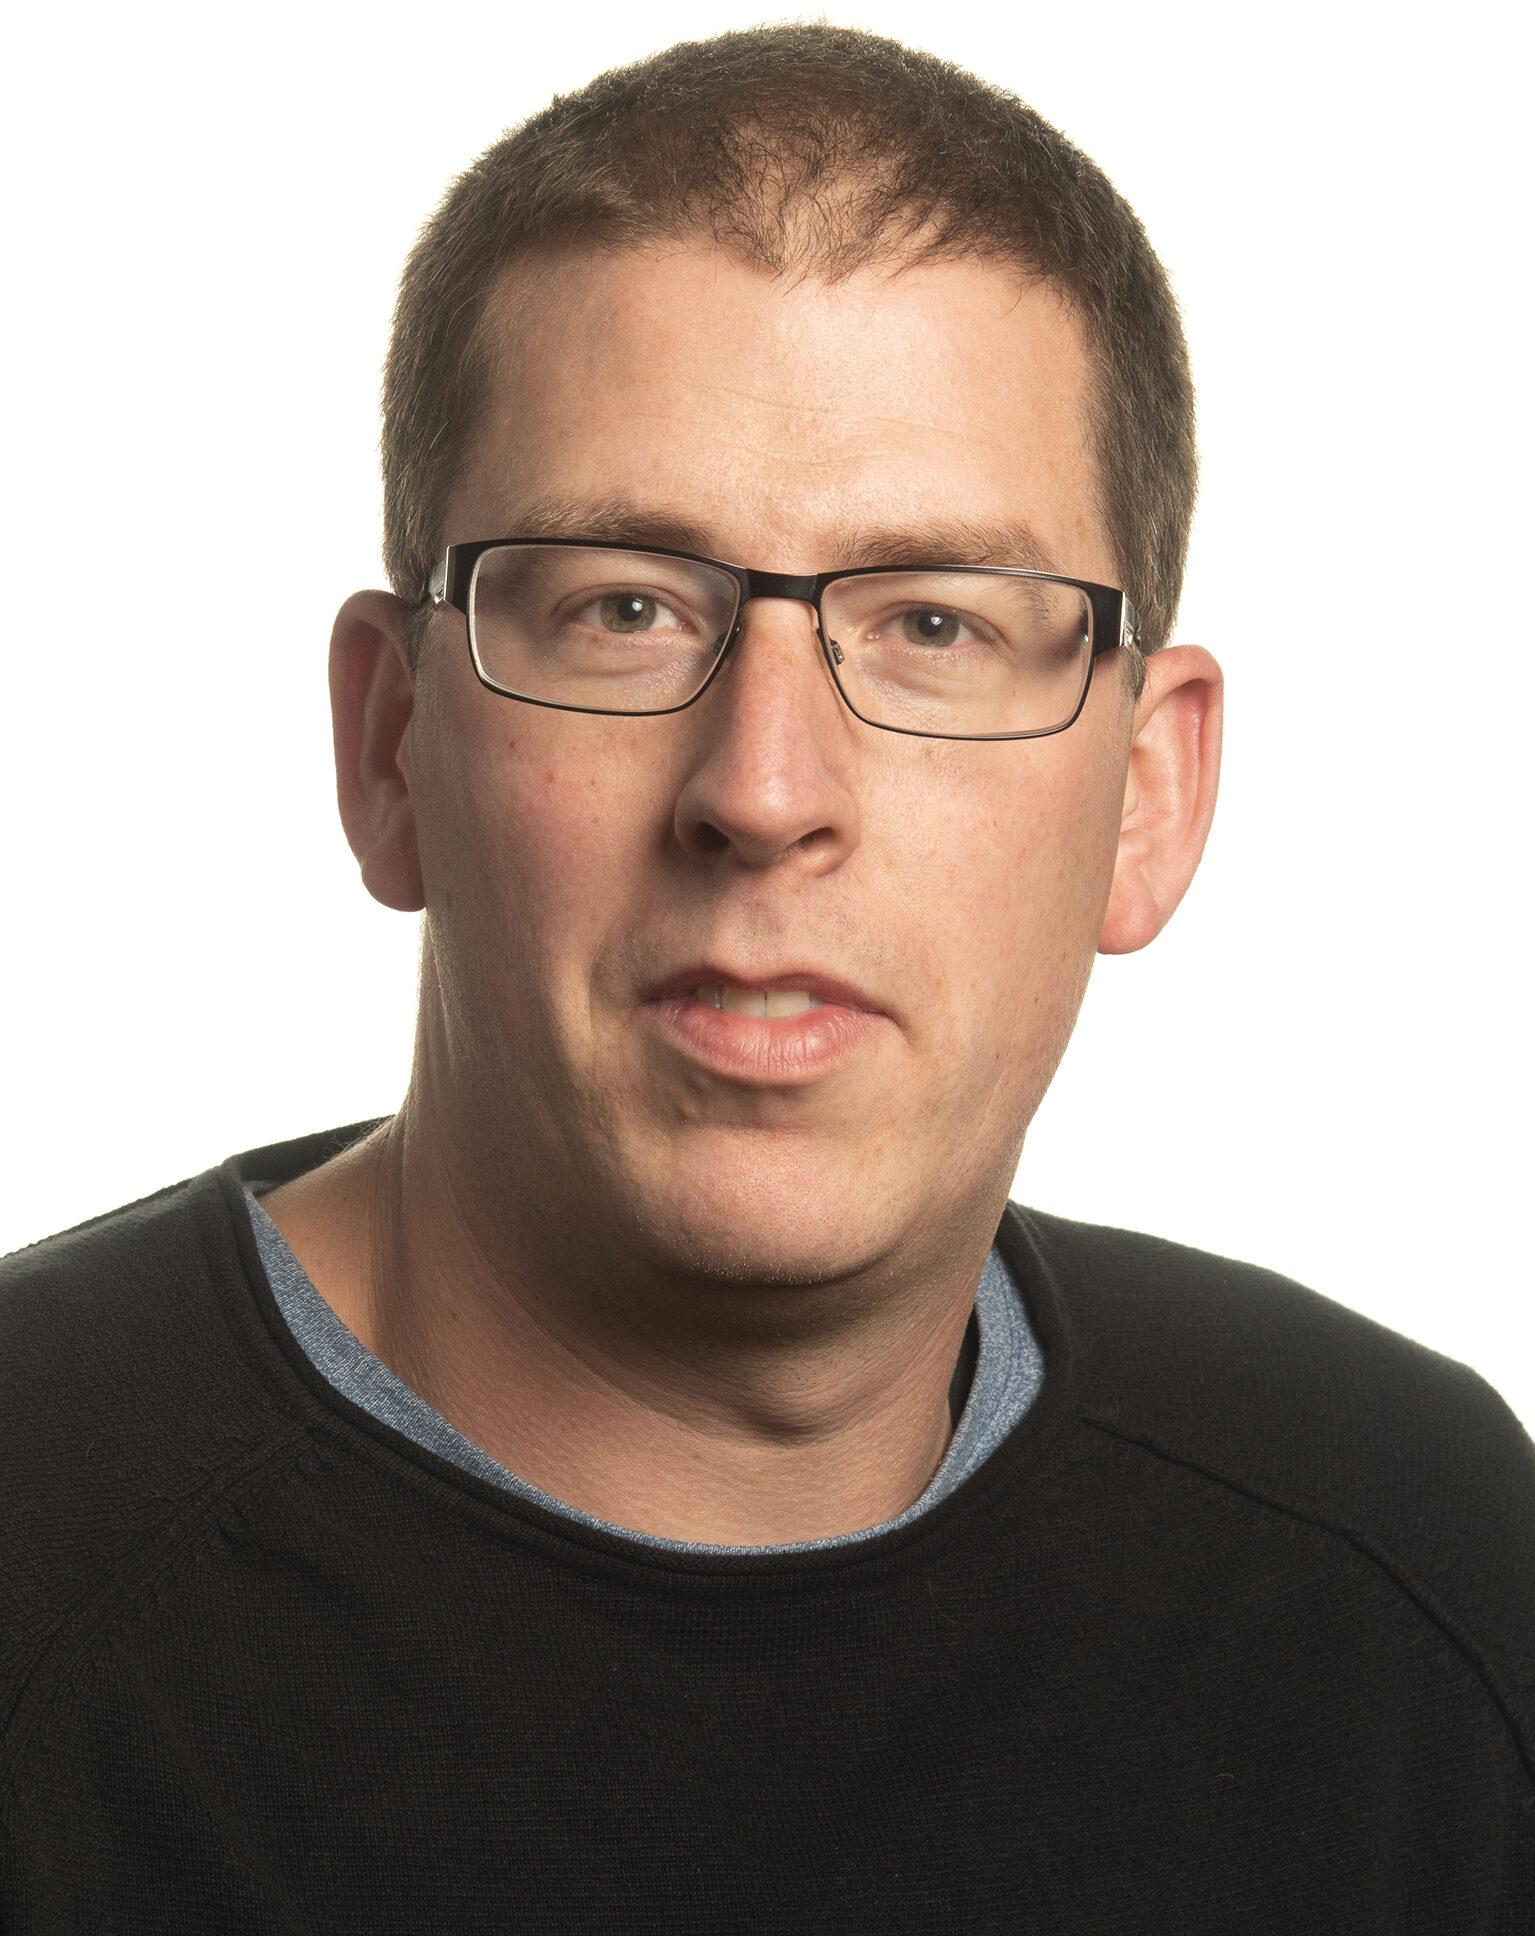 Dan Maagaard Olesen